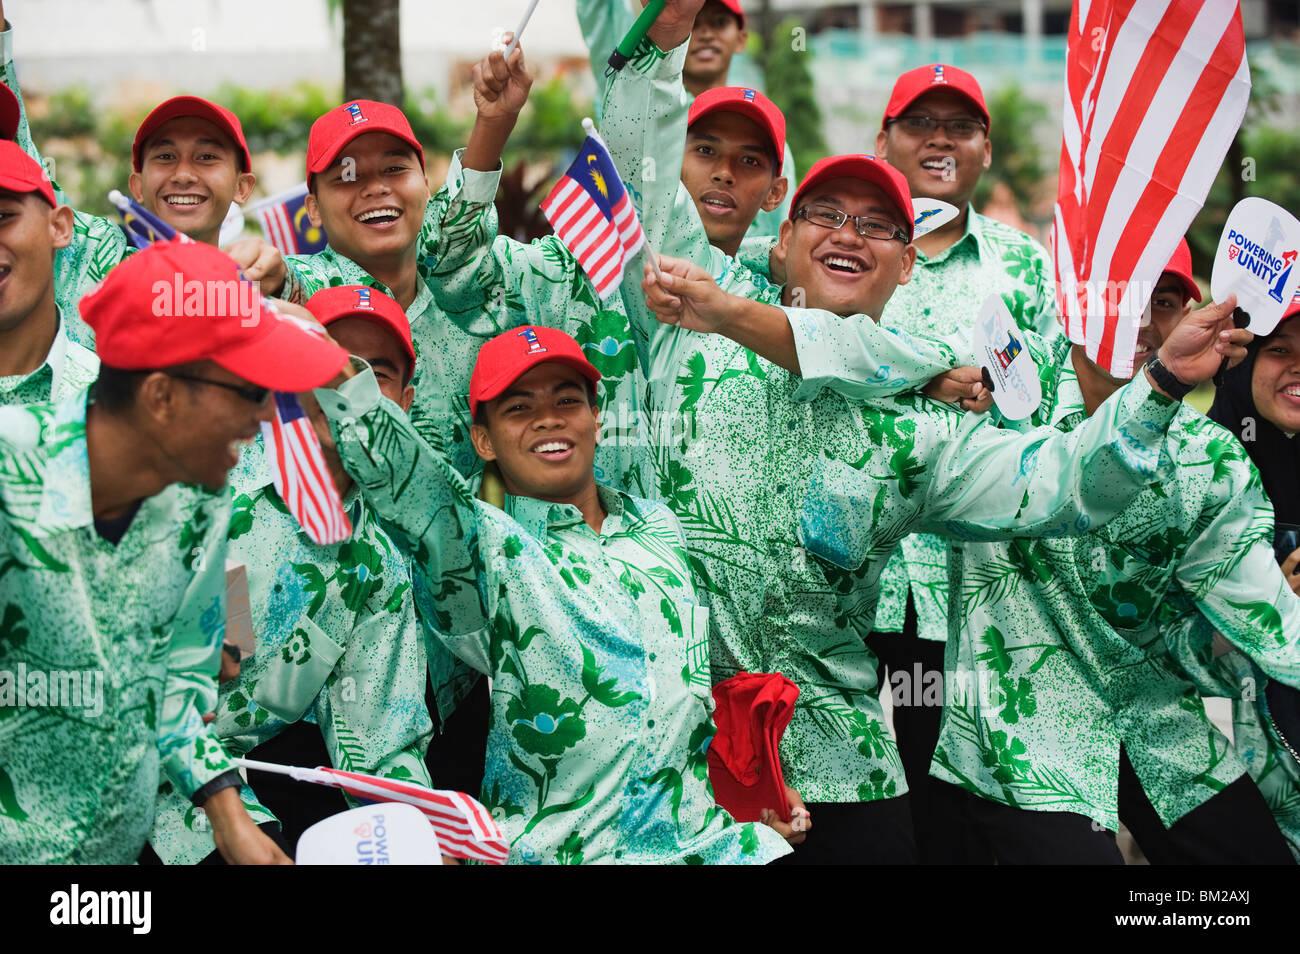 Independence Day celebrations, Kuala Lumpur, Malaysia, Southeast Asia - Stock Image